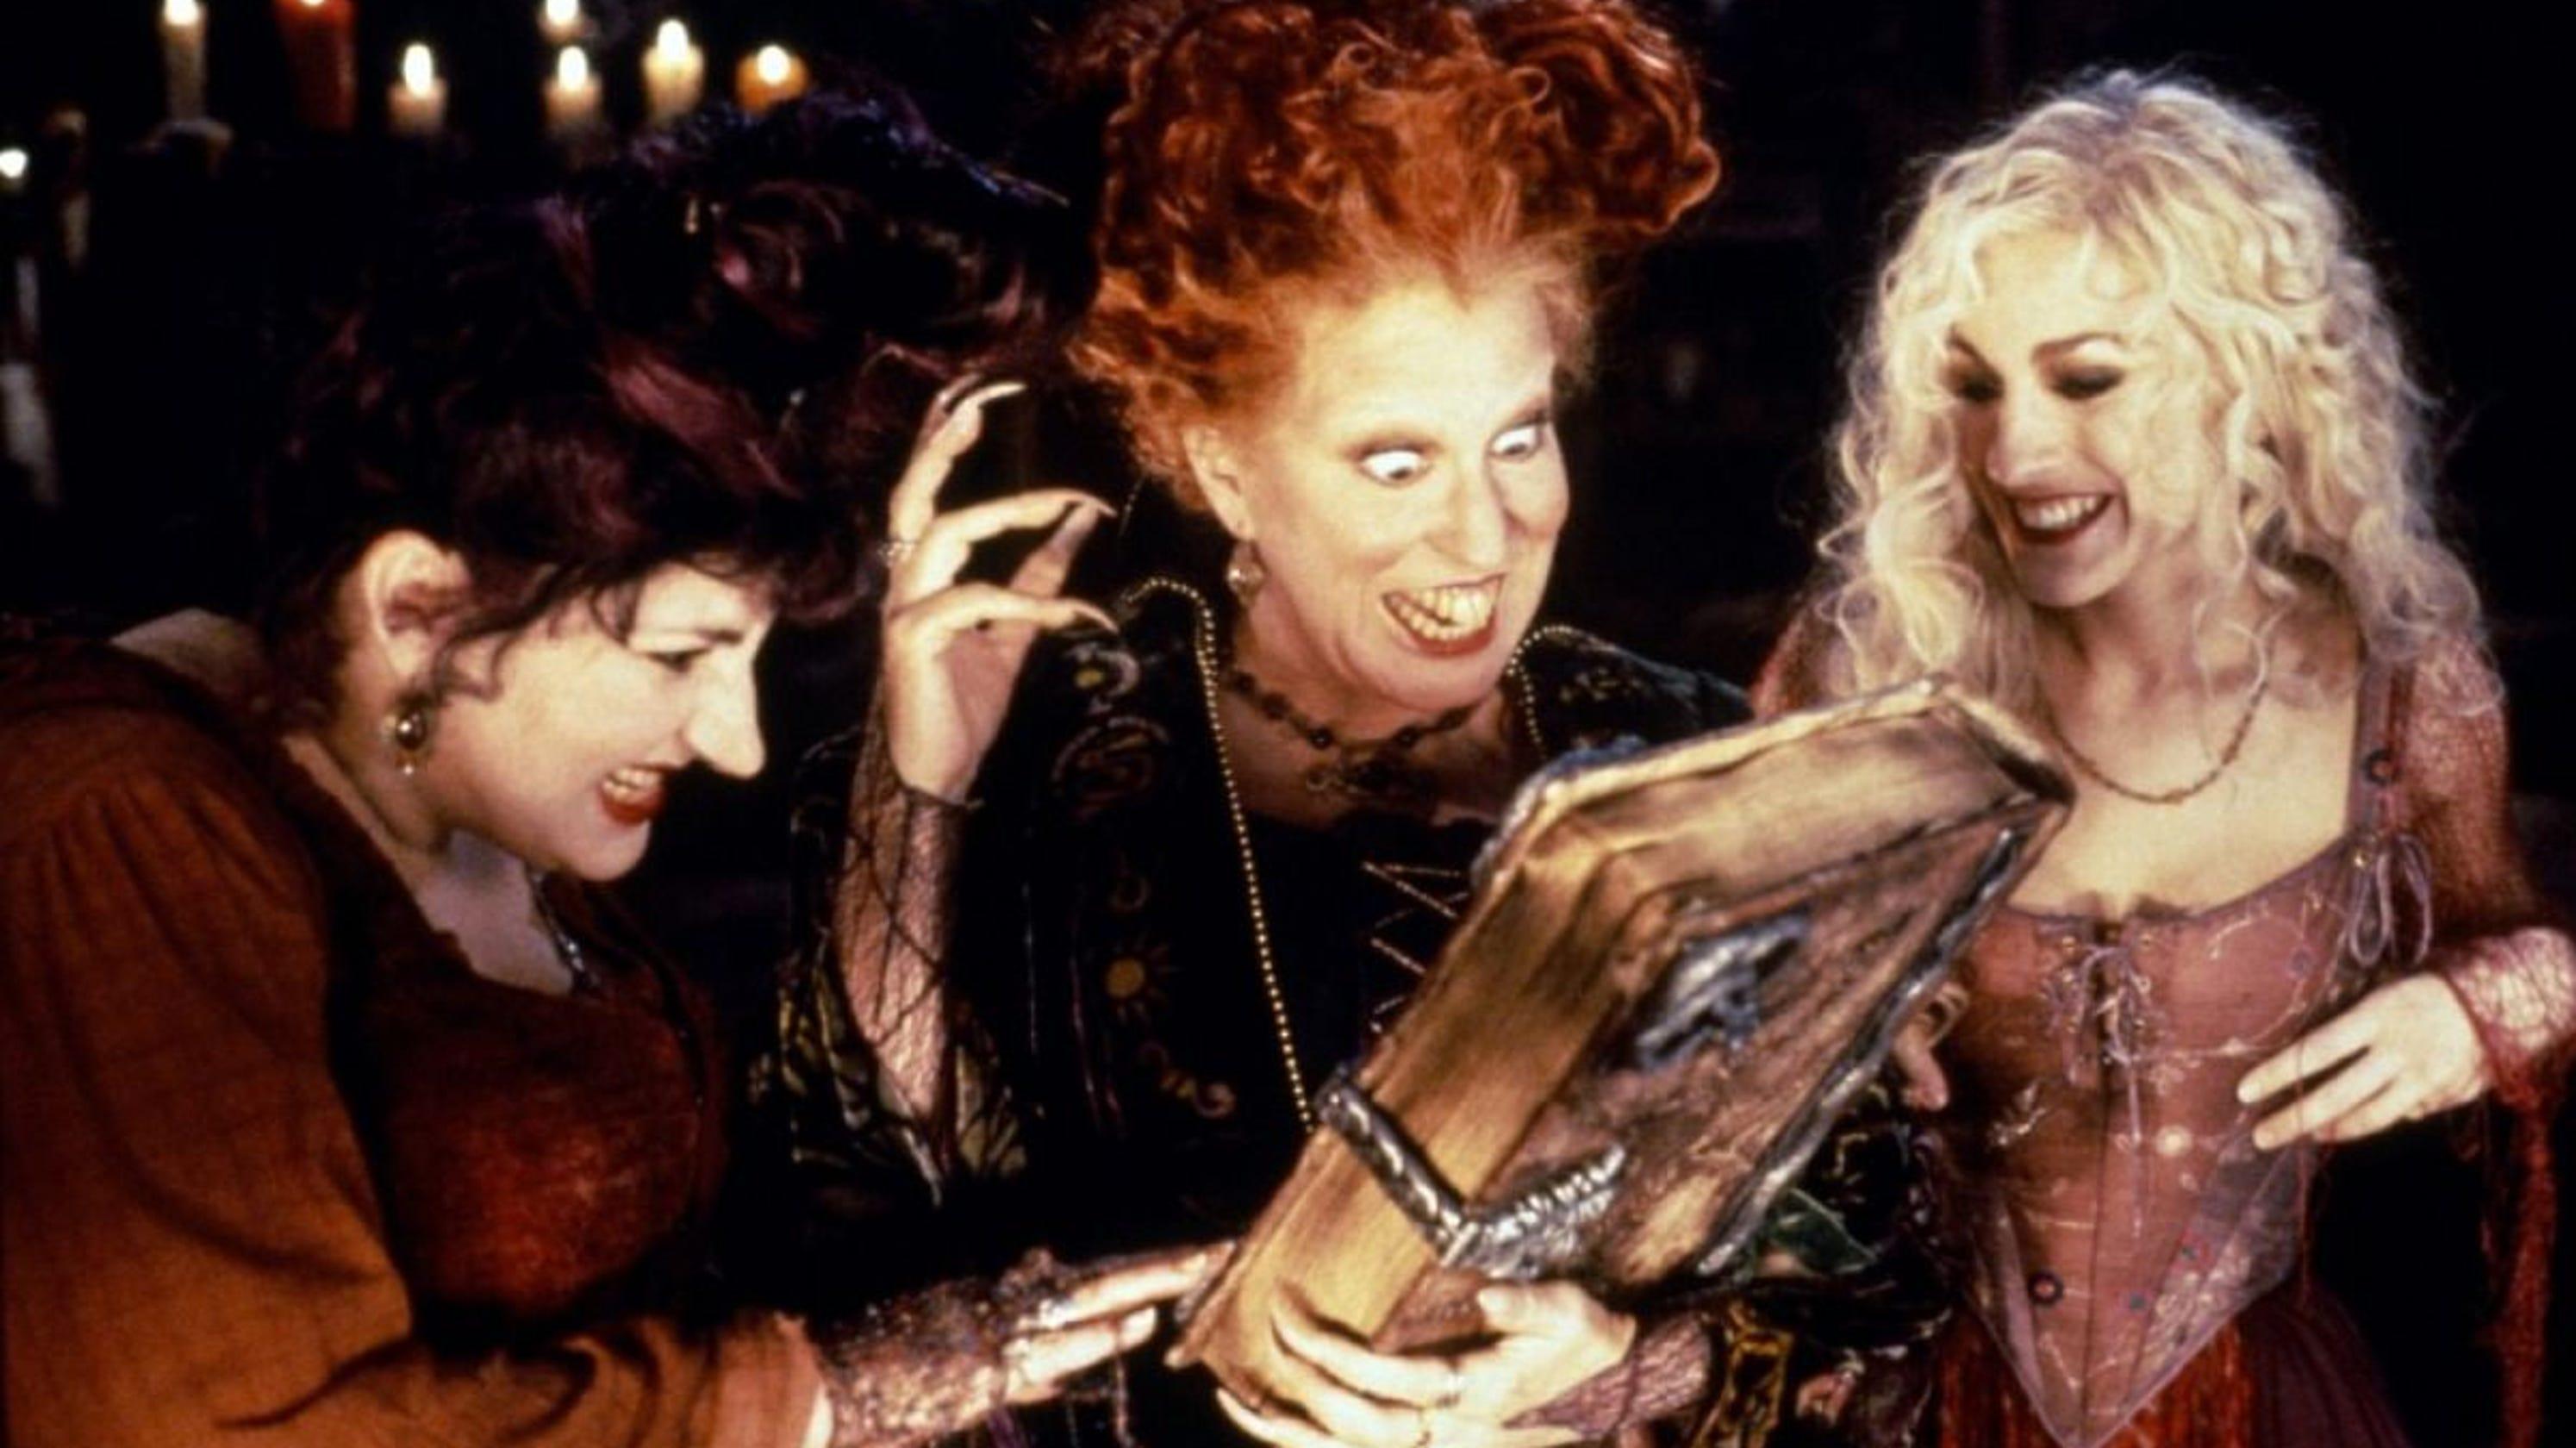 Freeform's '31 Nights of Halloween' full listing of movies